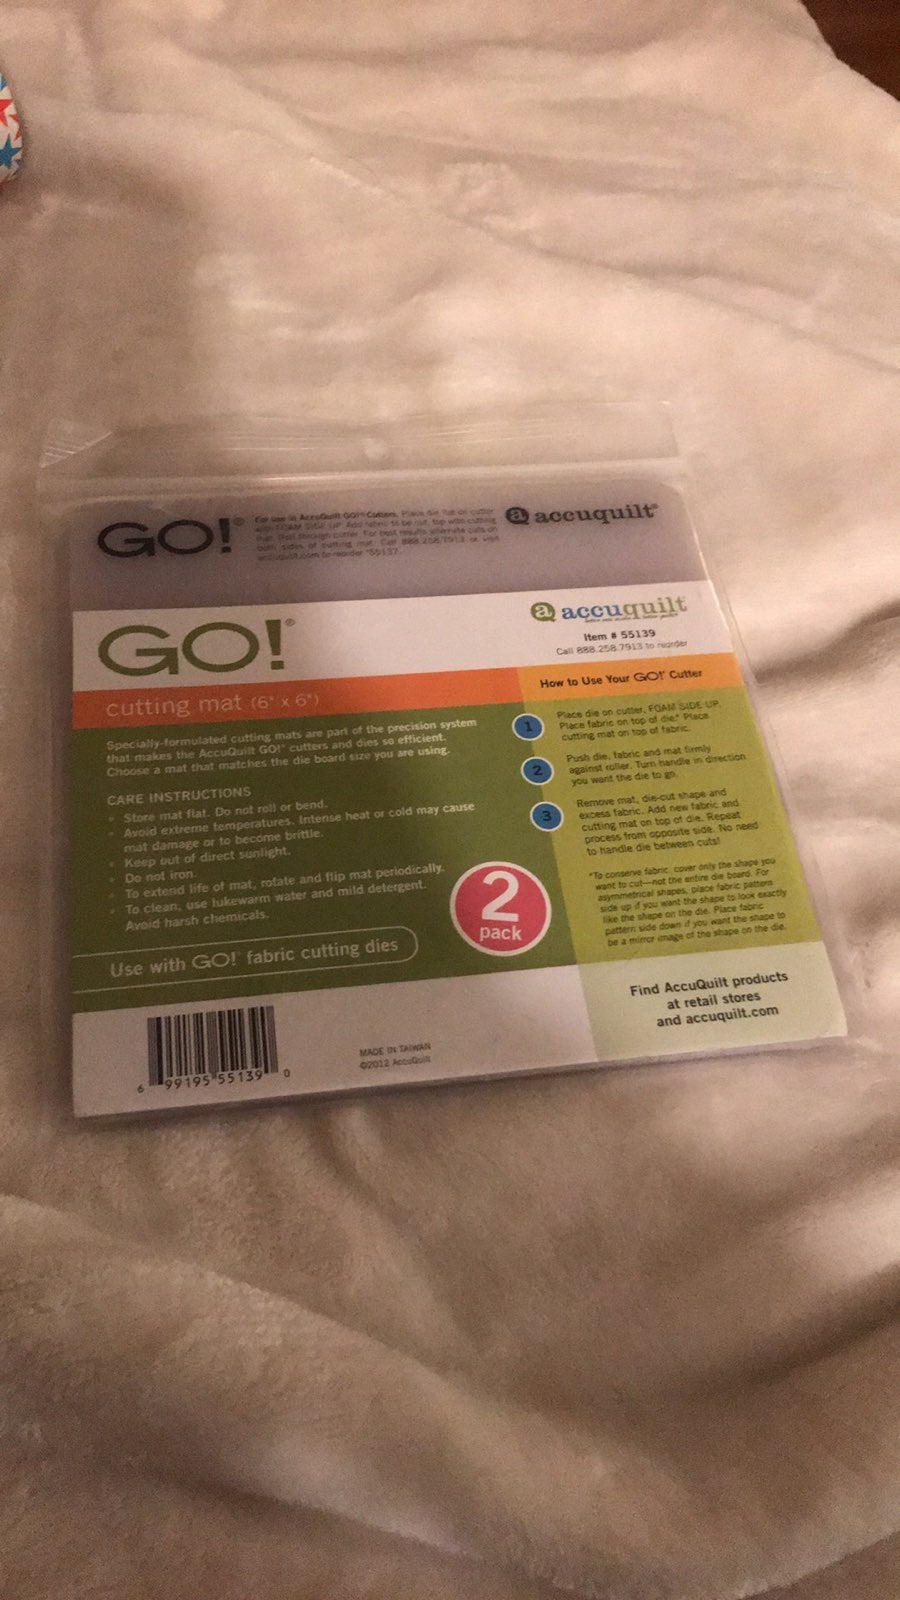 AccuQuilt GO! Cutting Mat-6 x 6 2-Pack